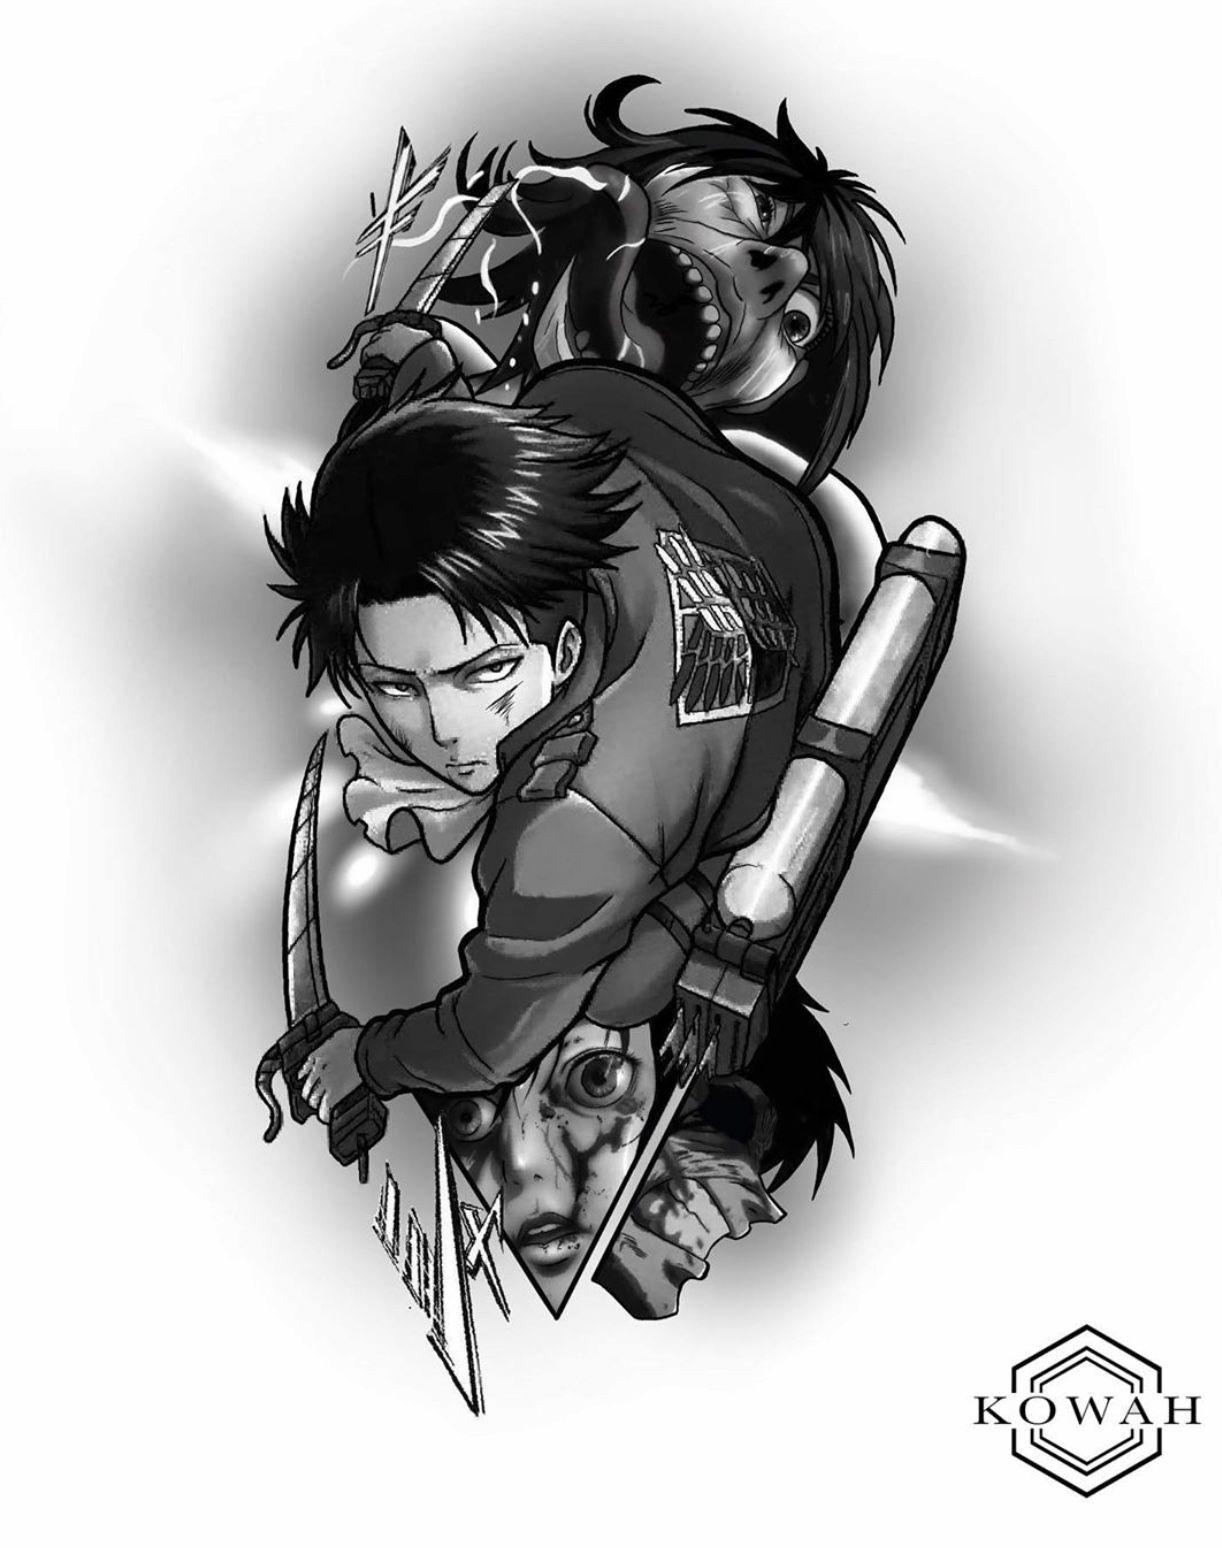 Pin By Karina Moon On At Attack On Titan Tattoo Anime Attack On Titan